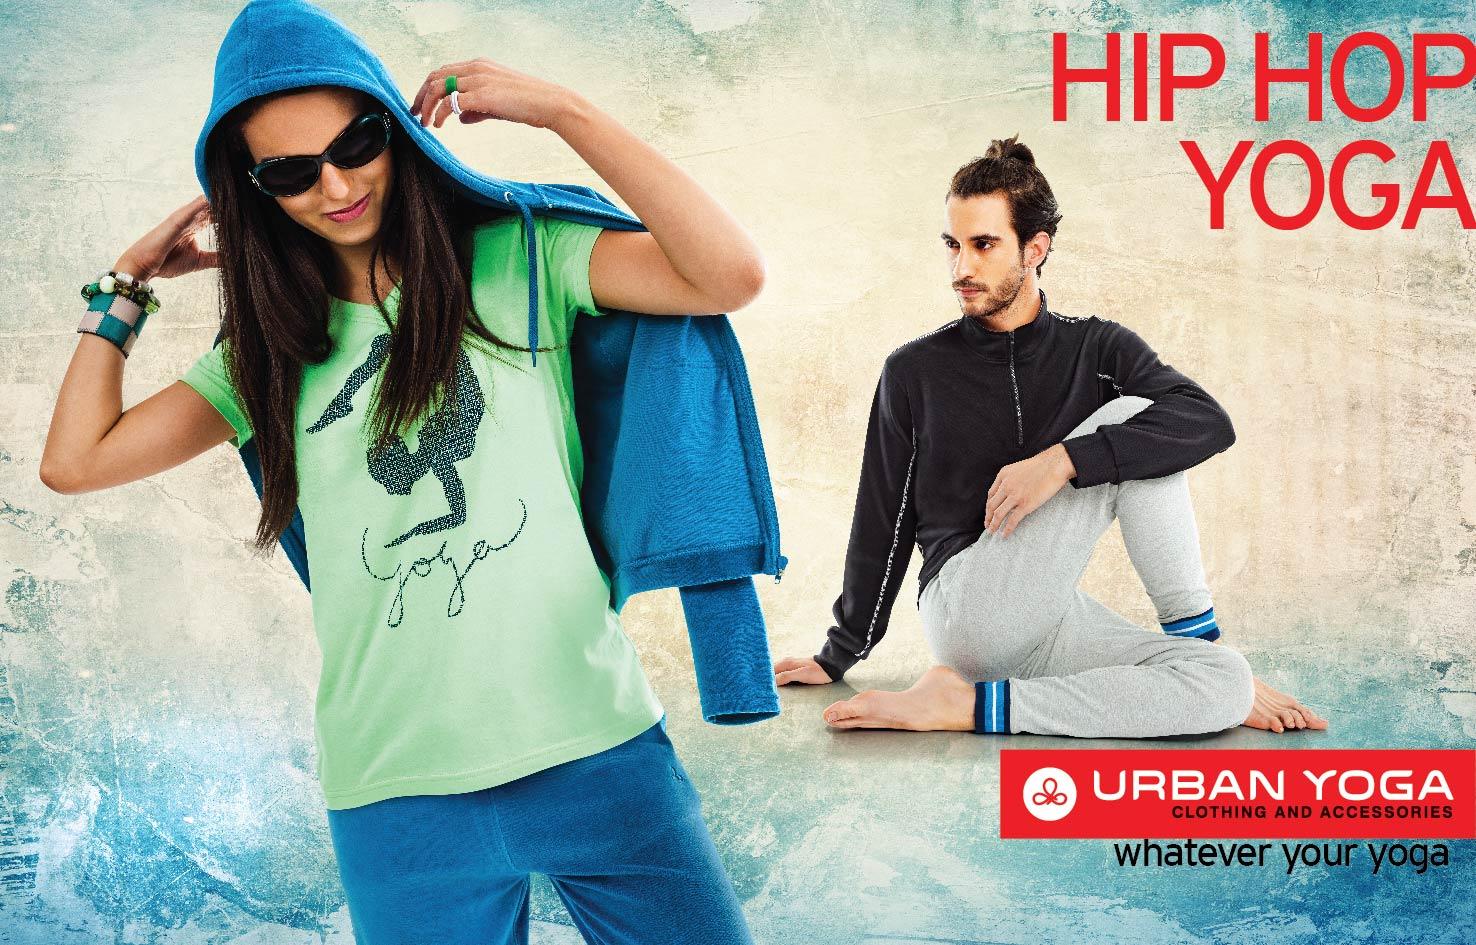 Hip Hop yoga-01.jpg